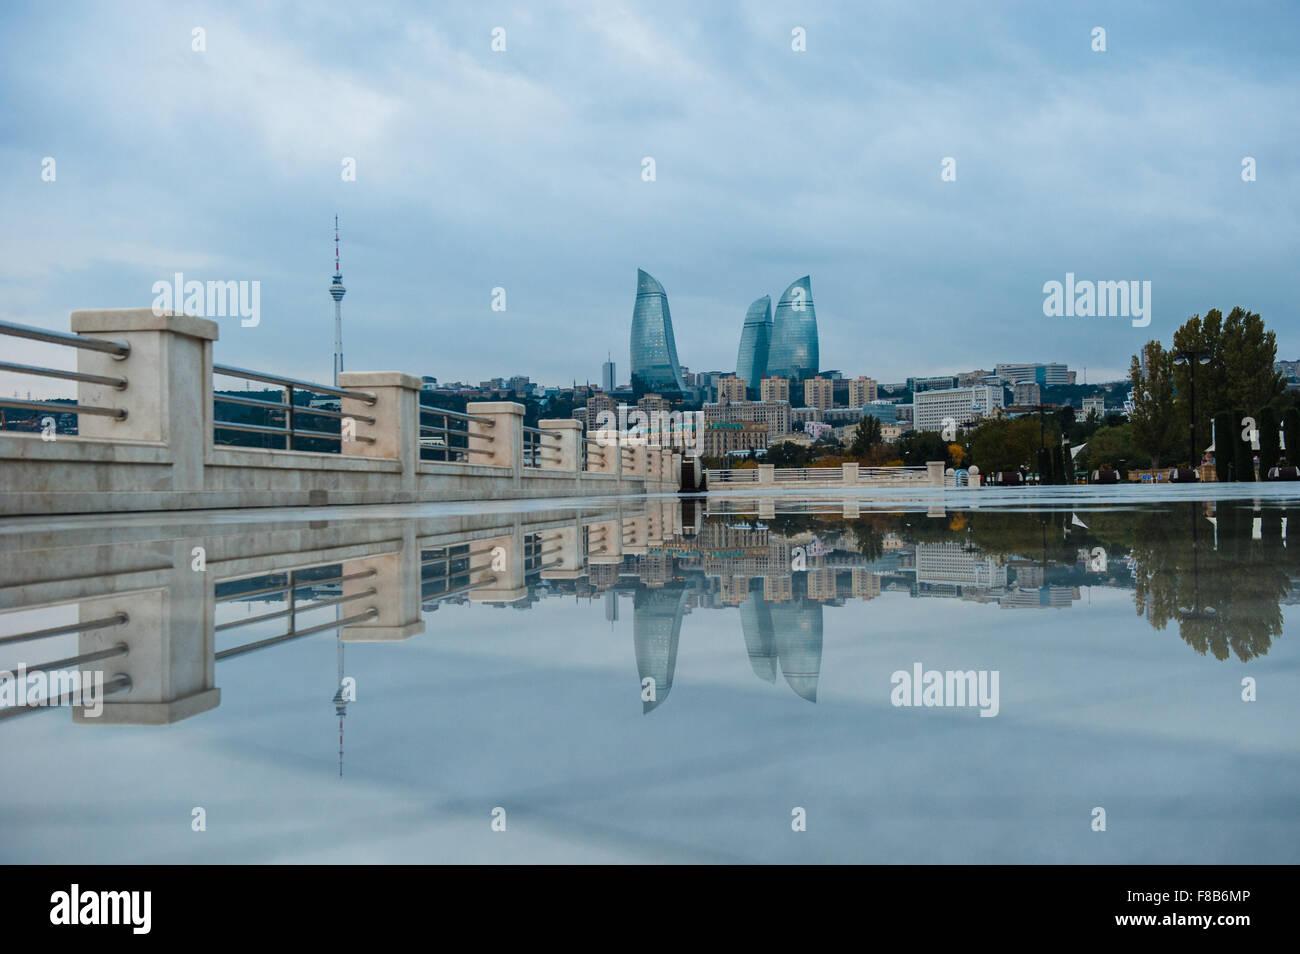 City view of the capital in Baku, Azerbaijan - Stock Image